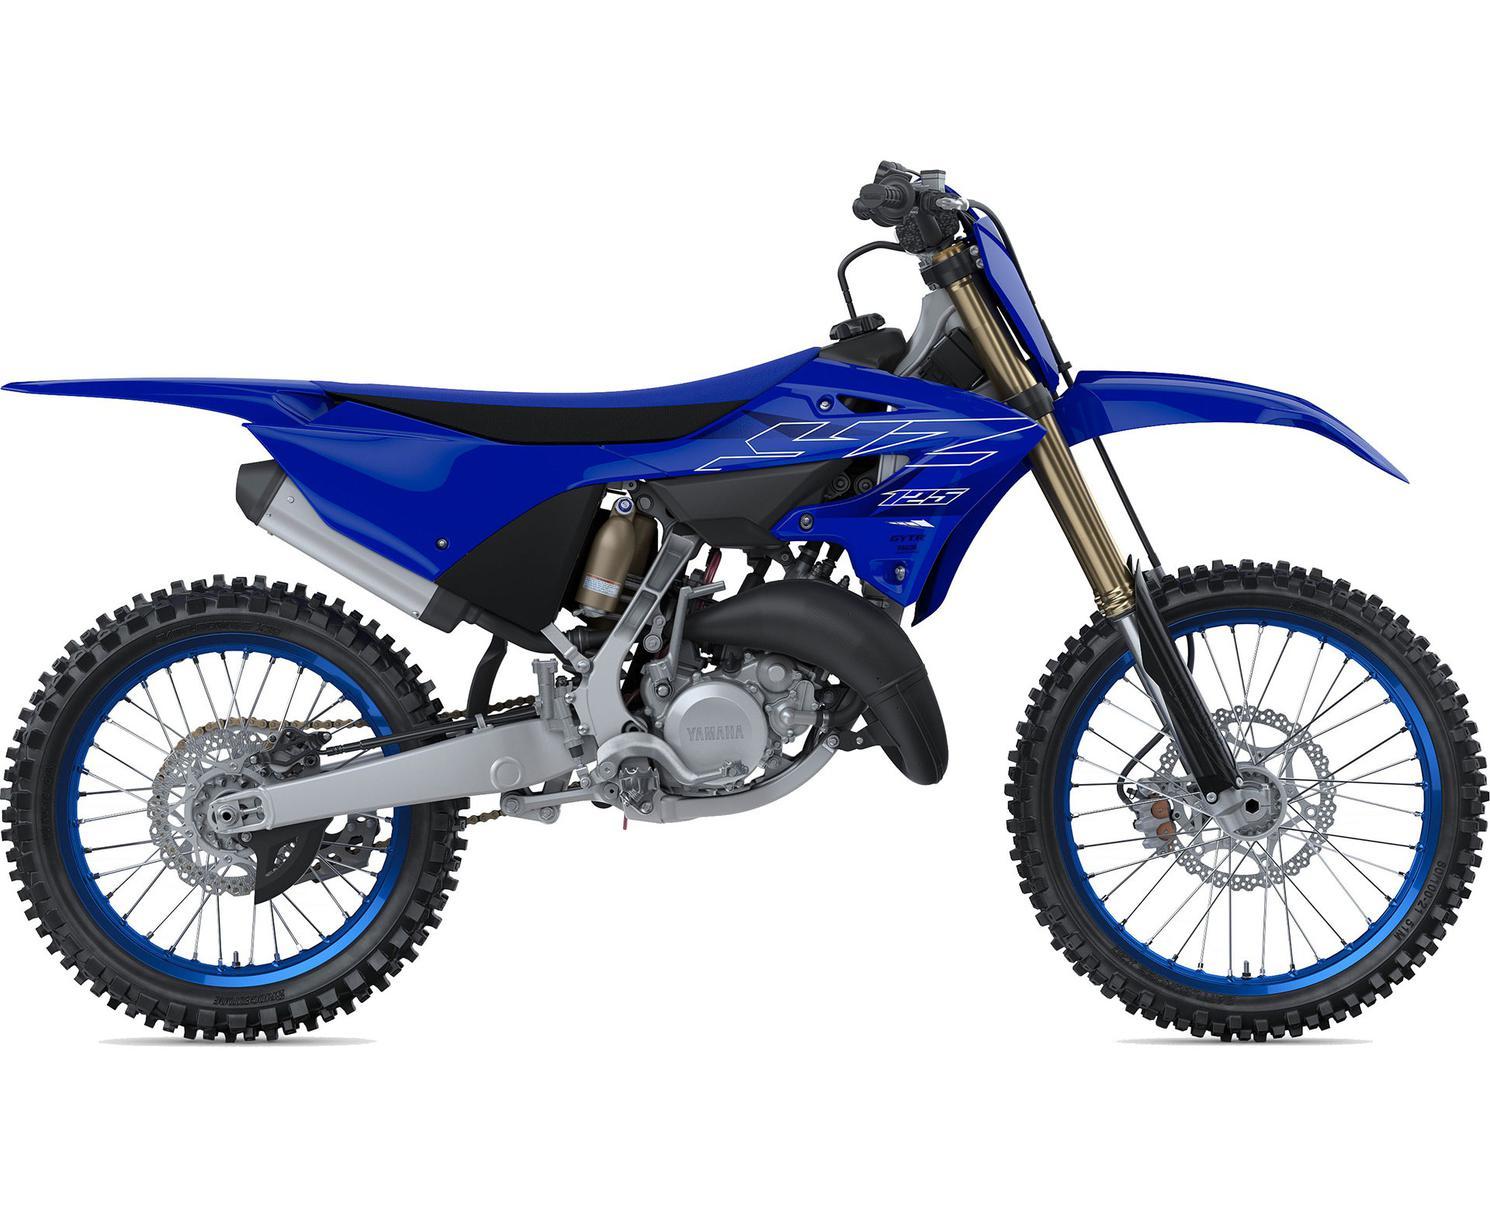 2022 Yamaha YZ125 Team Yamaha Blue